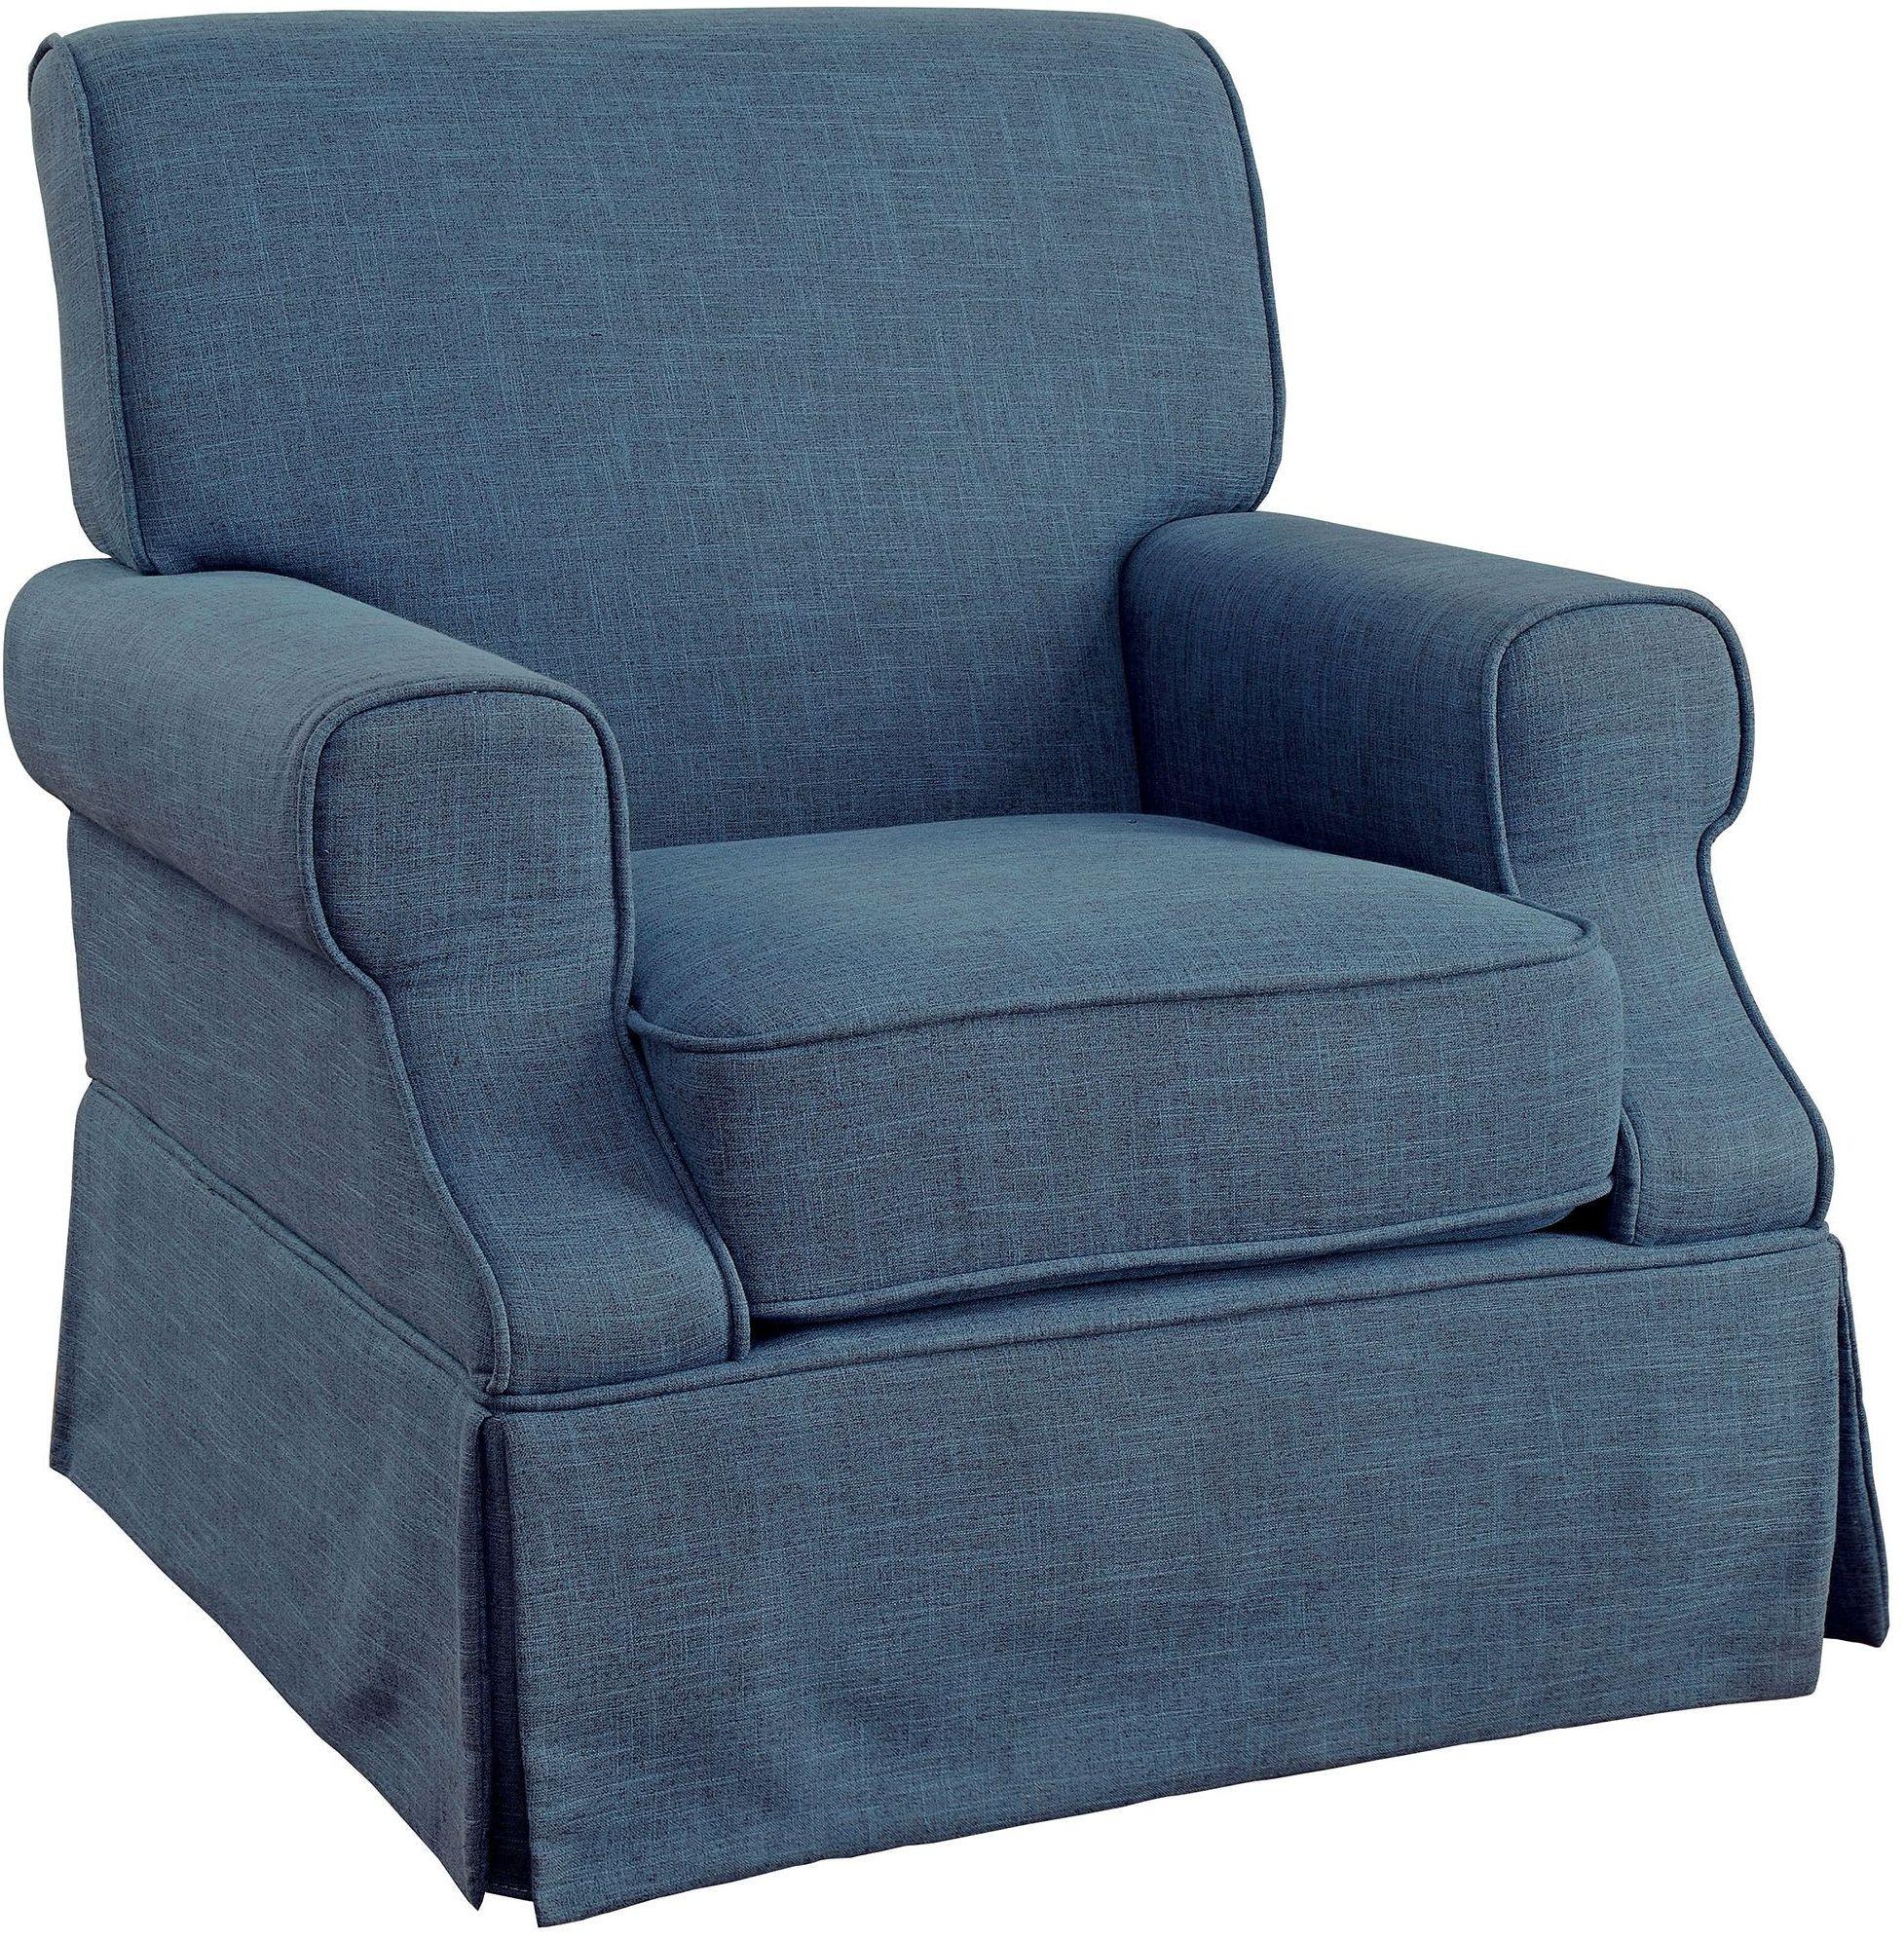 Leela Blue 360 Swivel Glider  Rocker Chair from Furniture